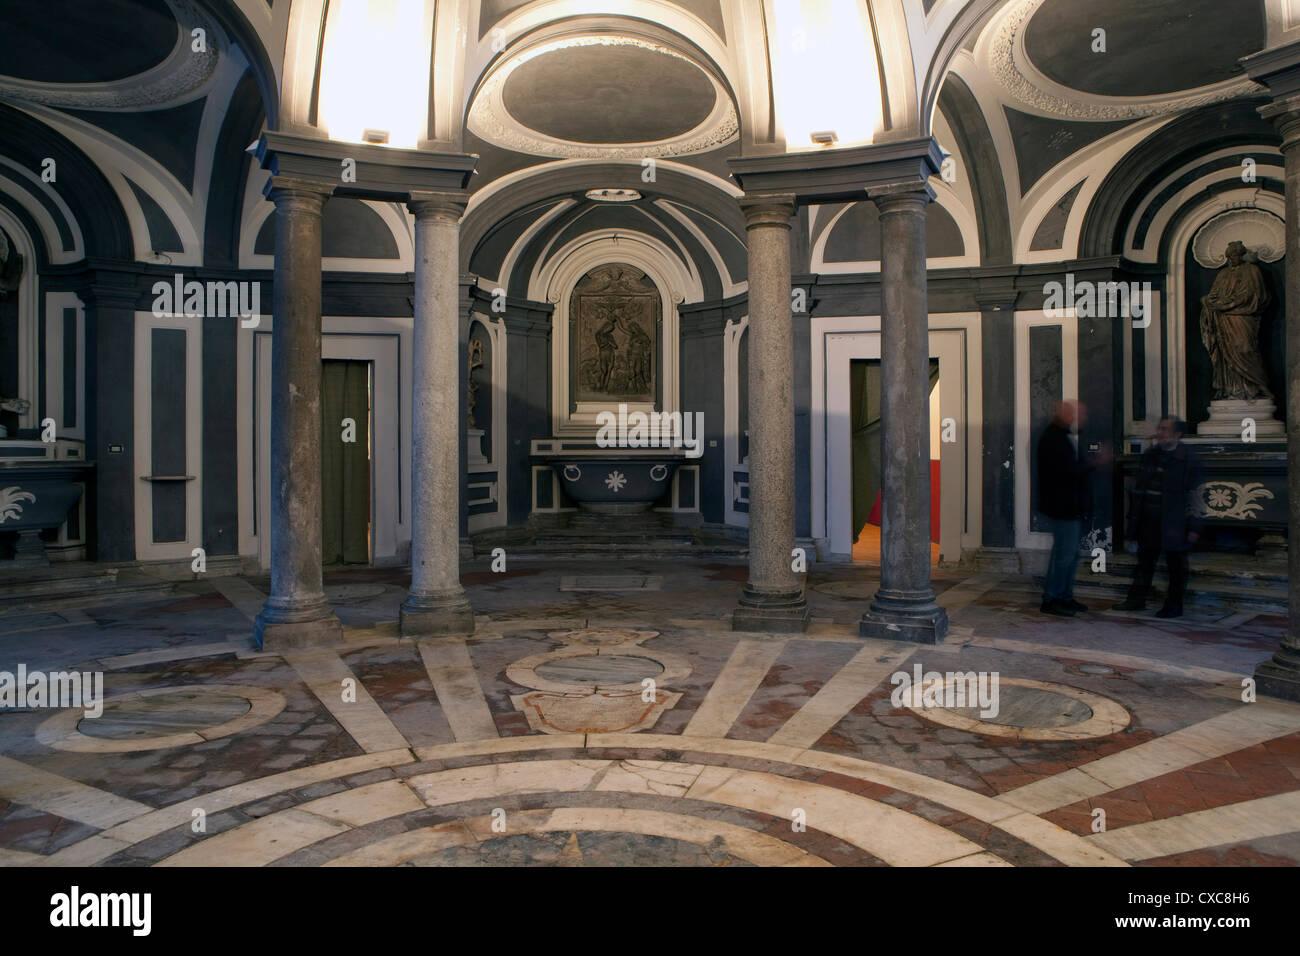 The Carlo Vanvitelli underground basilica of the SS Annunziata, Naples, Campania, Italy - Stock Image